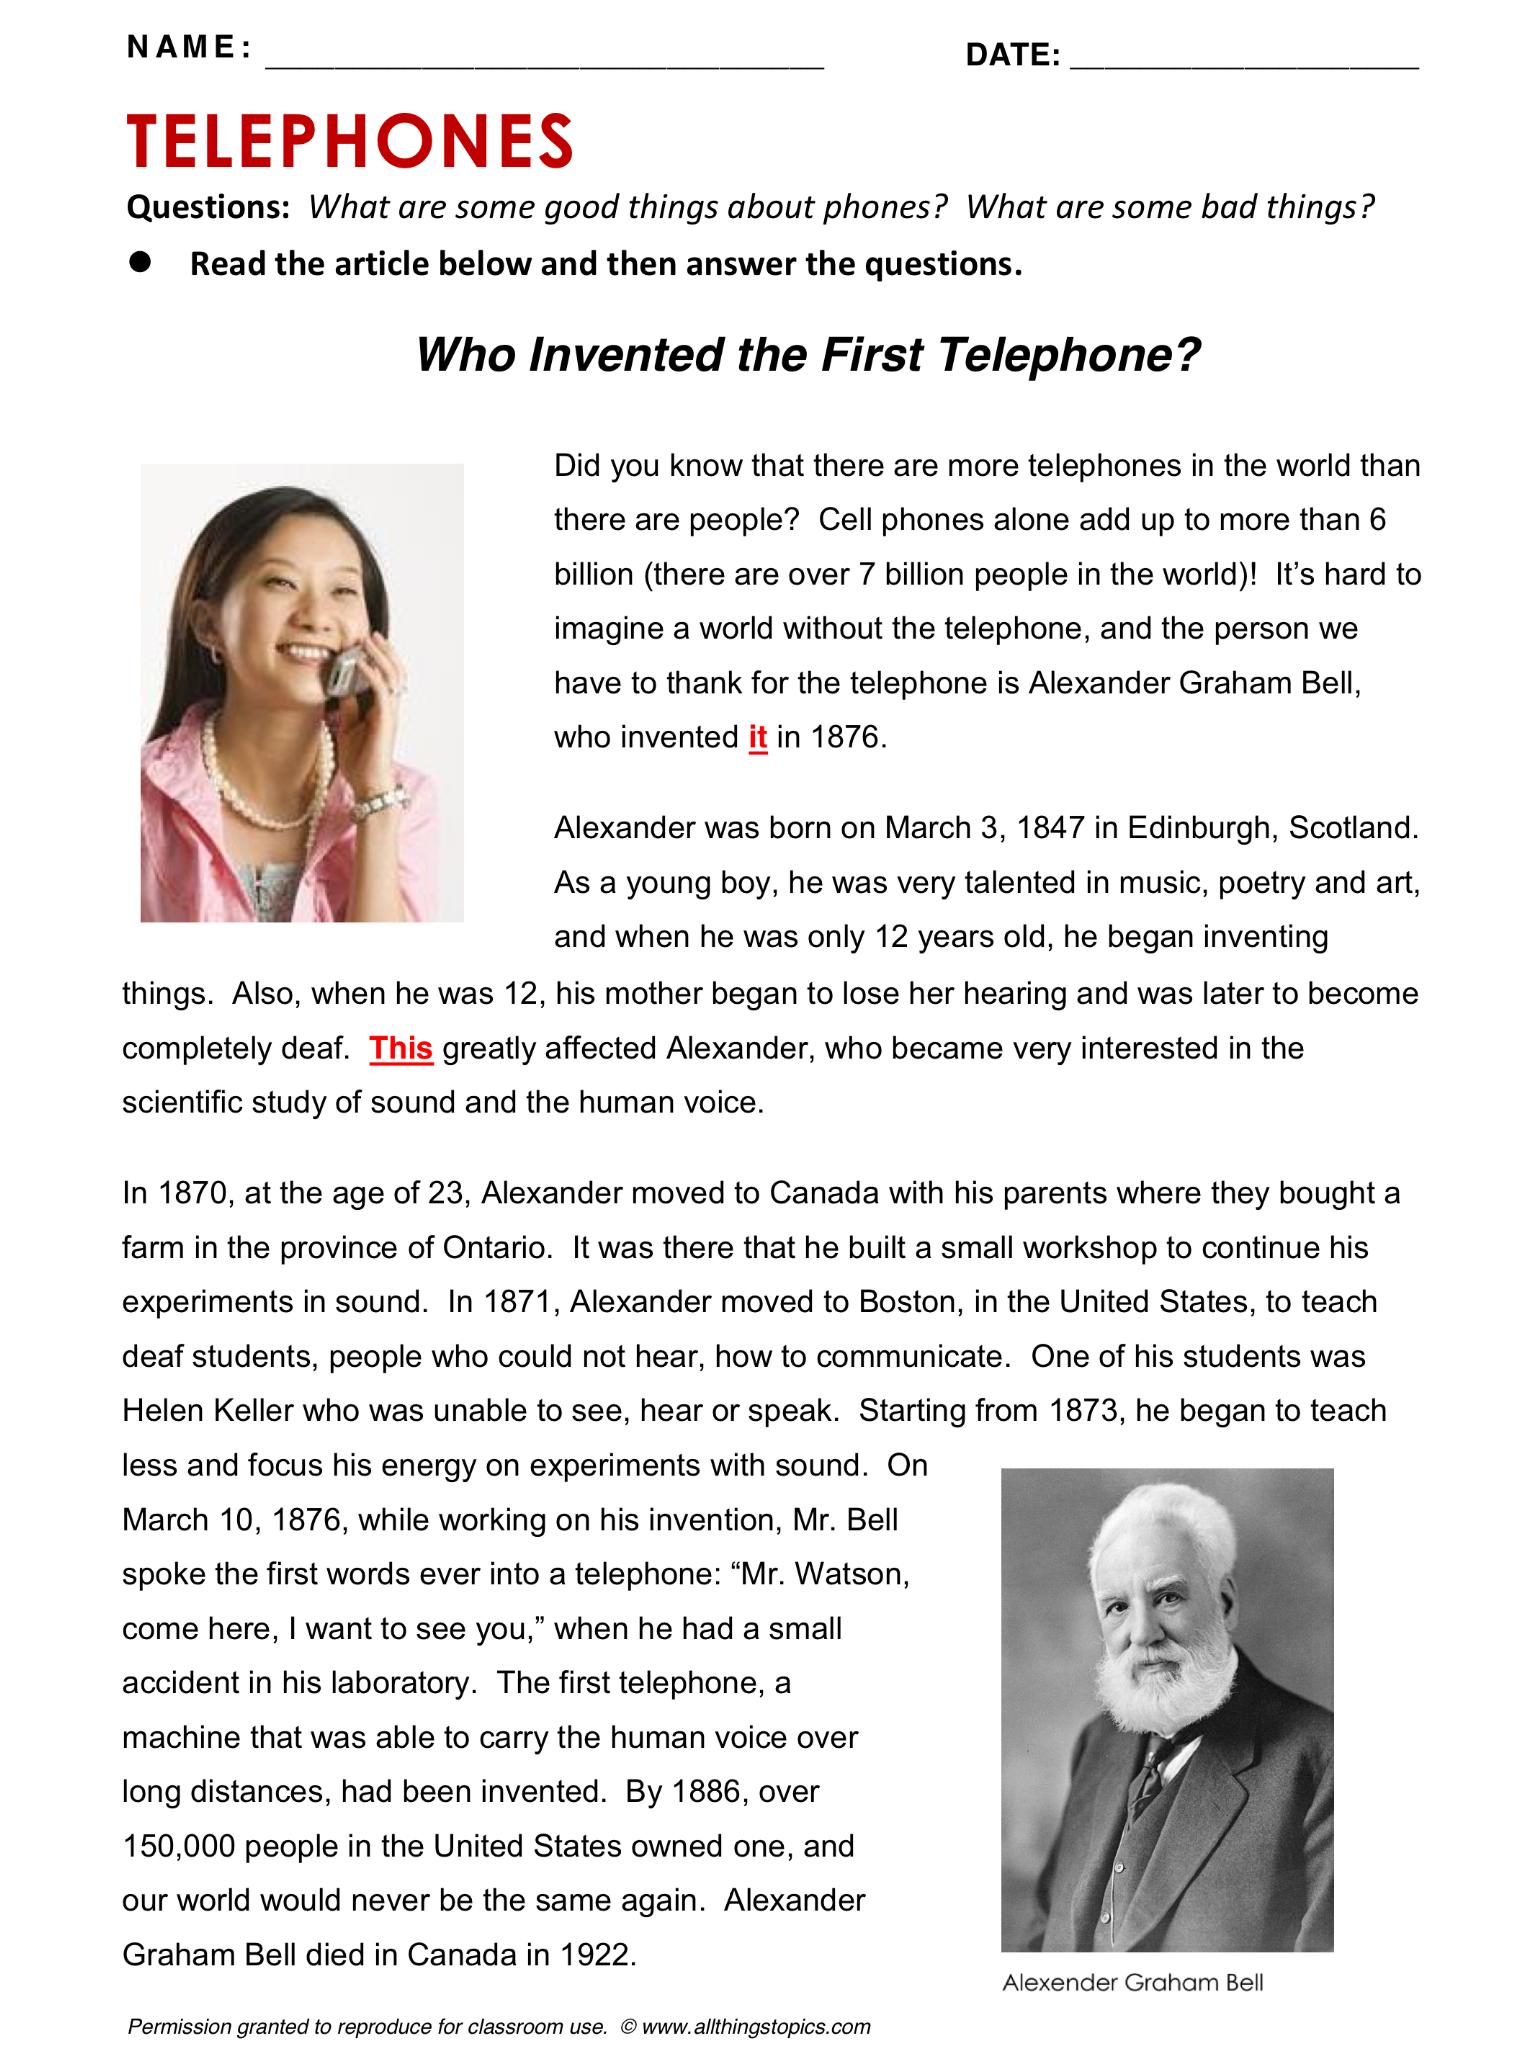 Telephone Phone English Learning English Vocabulary Esl English Phrases Http Www A English Reading Reading Comprehension Reading Comprehension Lessons [ 2048 x 1536 Pixel ]